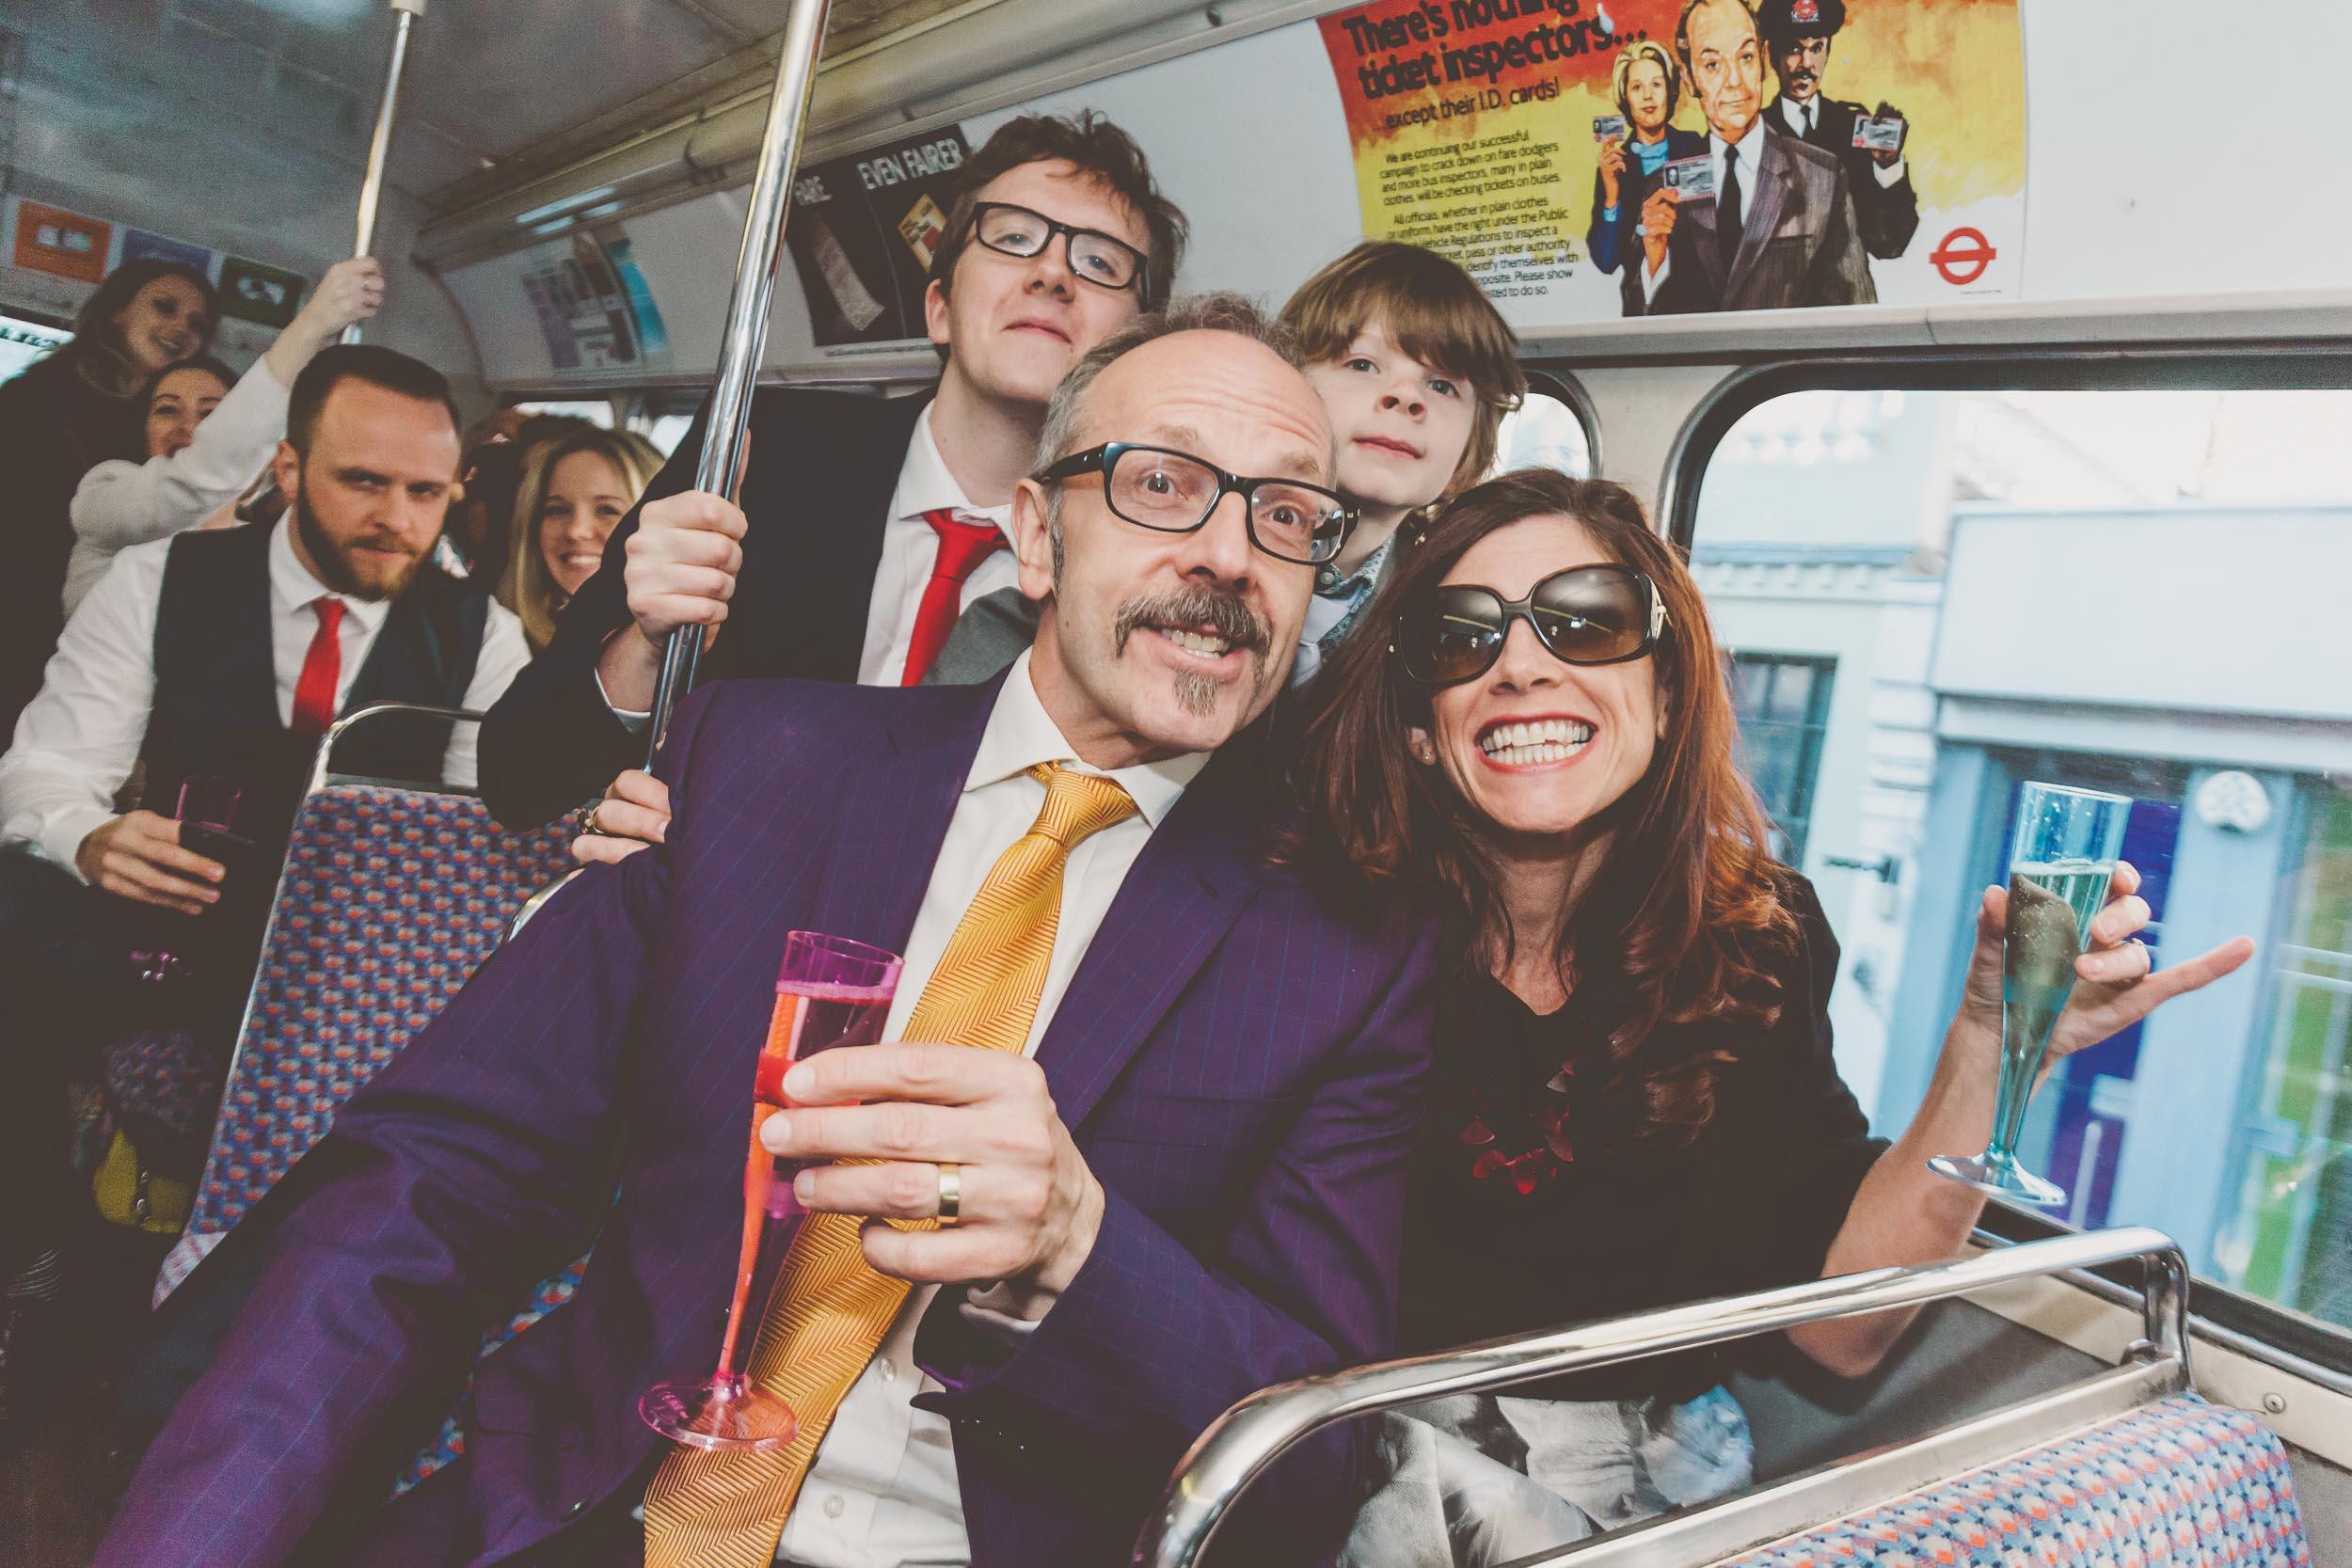 red-double-decker-bus-london-wedding.jpg